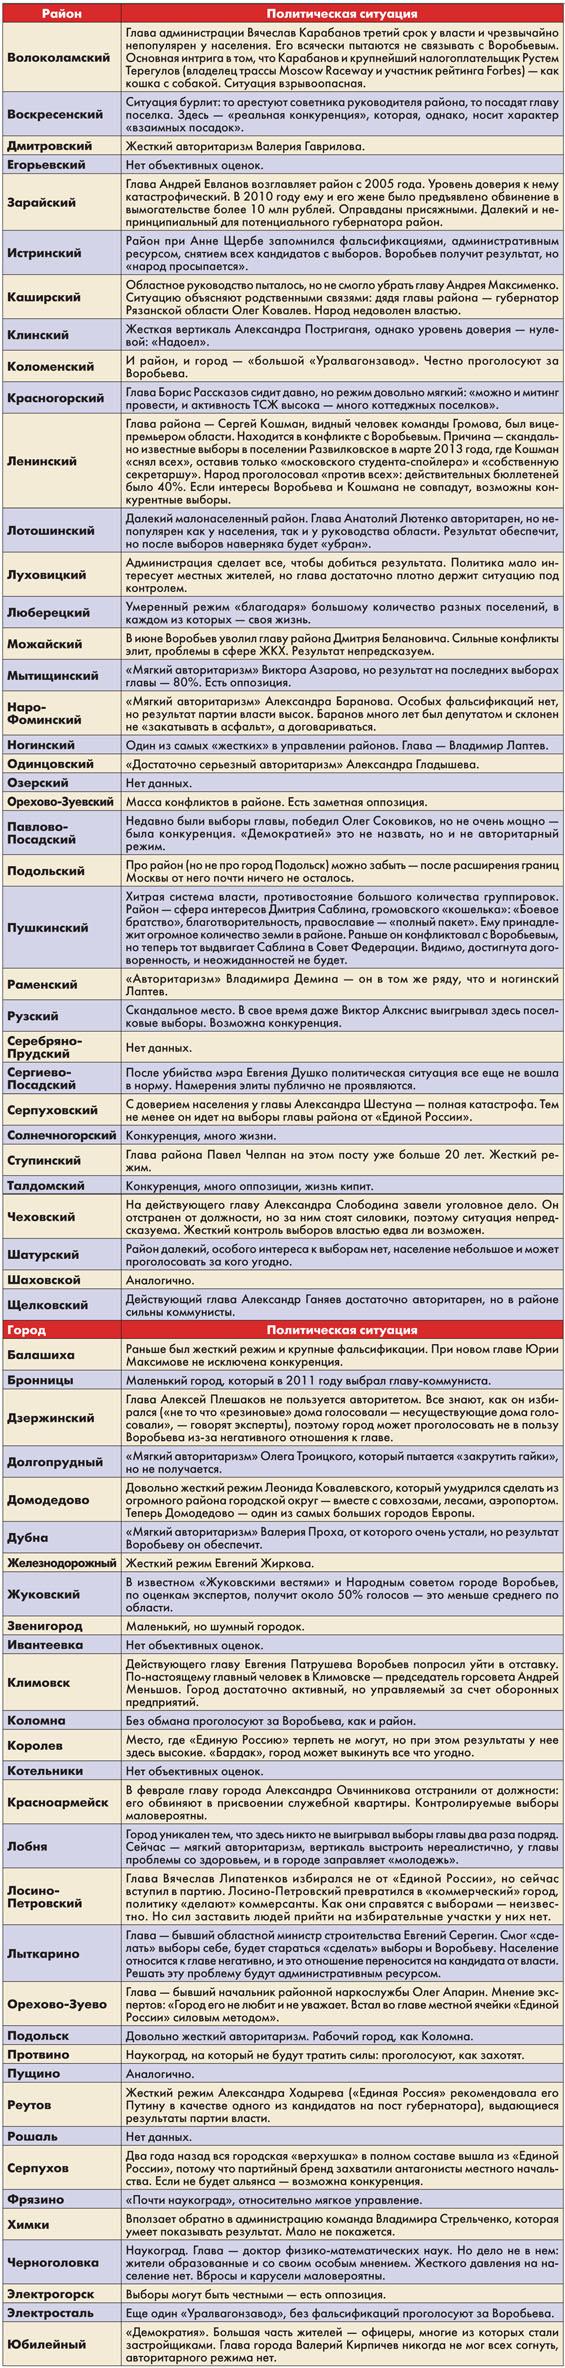 Karta-gorodov-MO